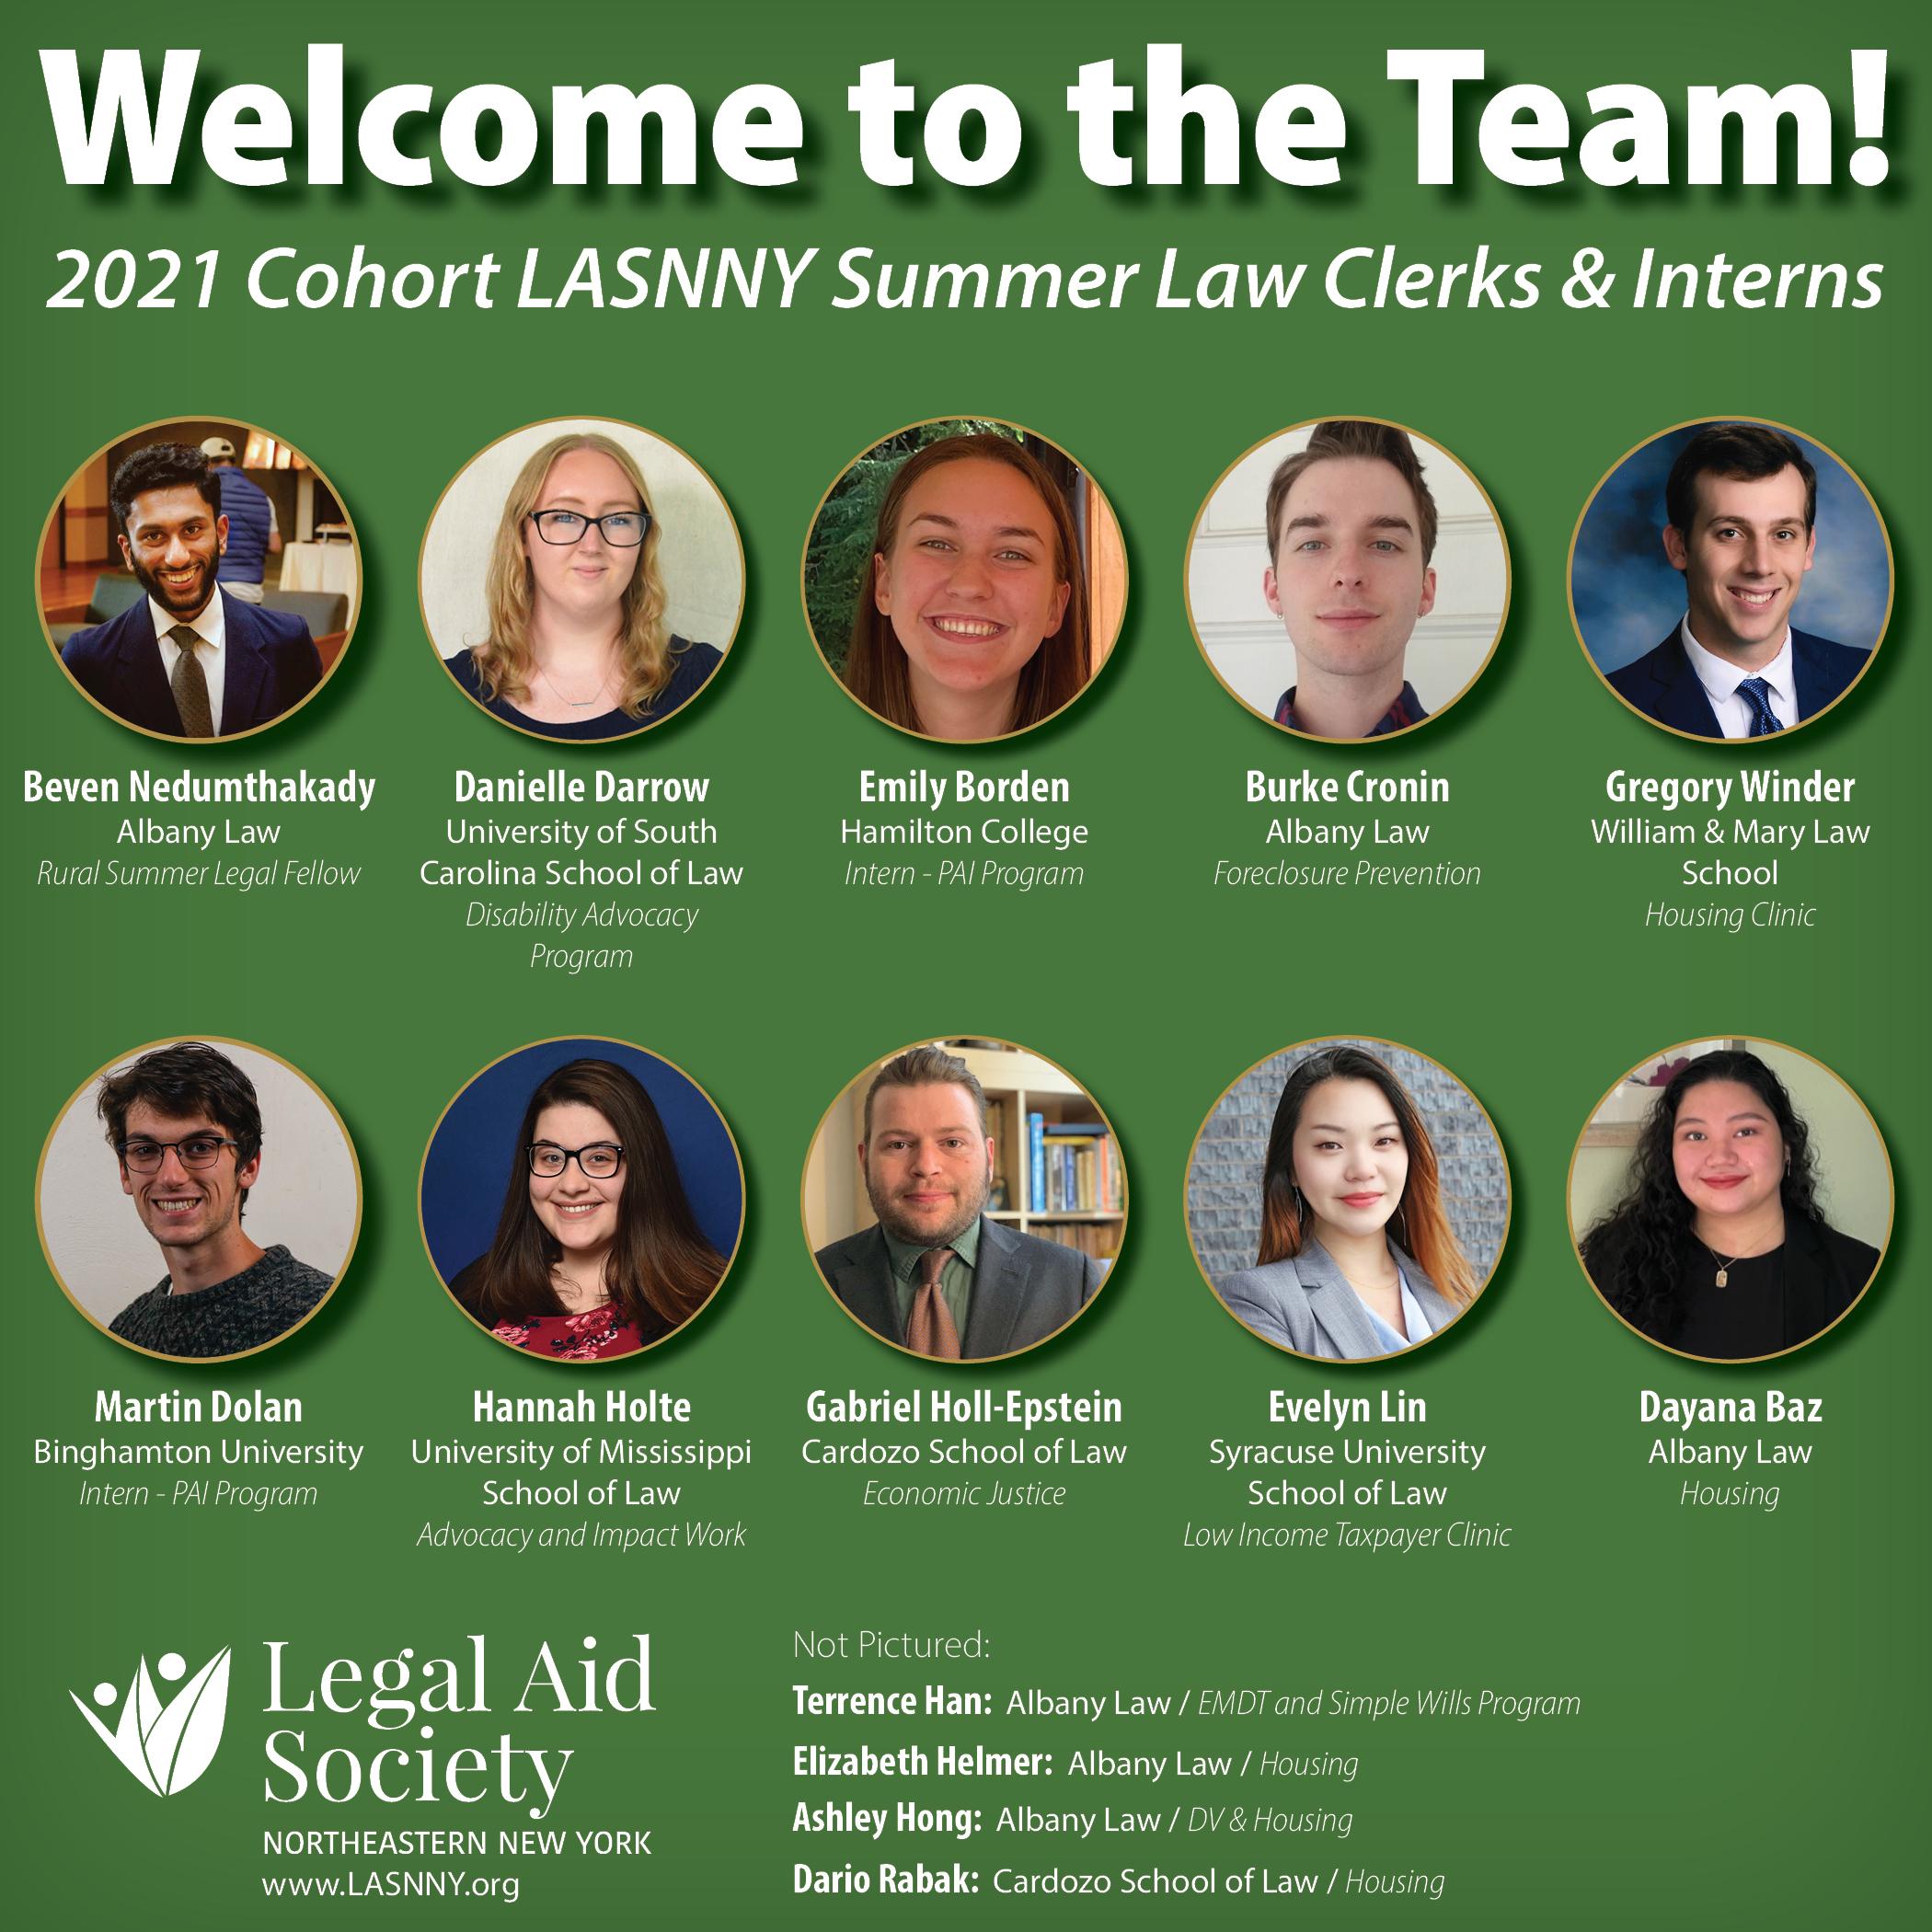 Summer 2021 Cohort of Law Clerks & Interns